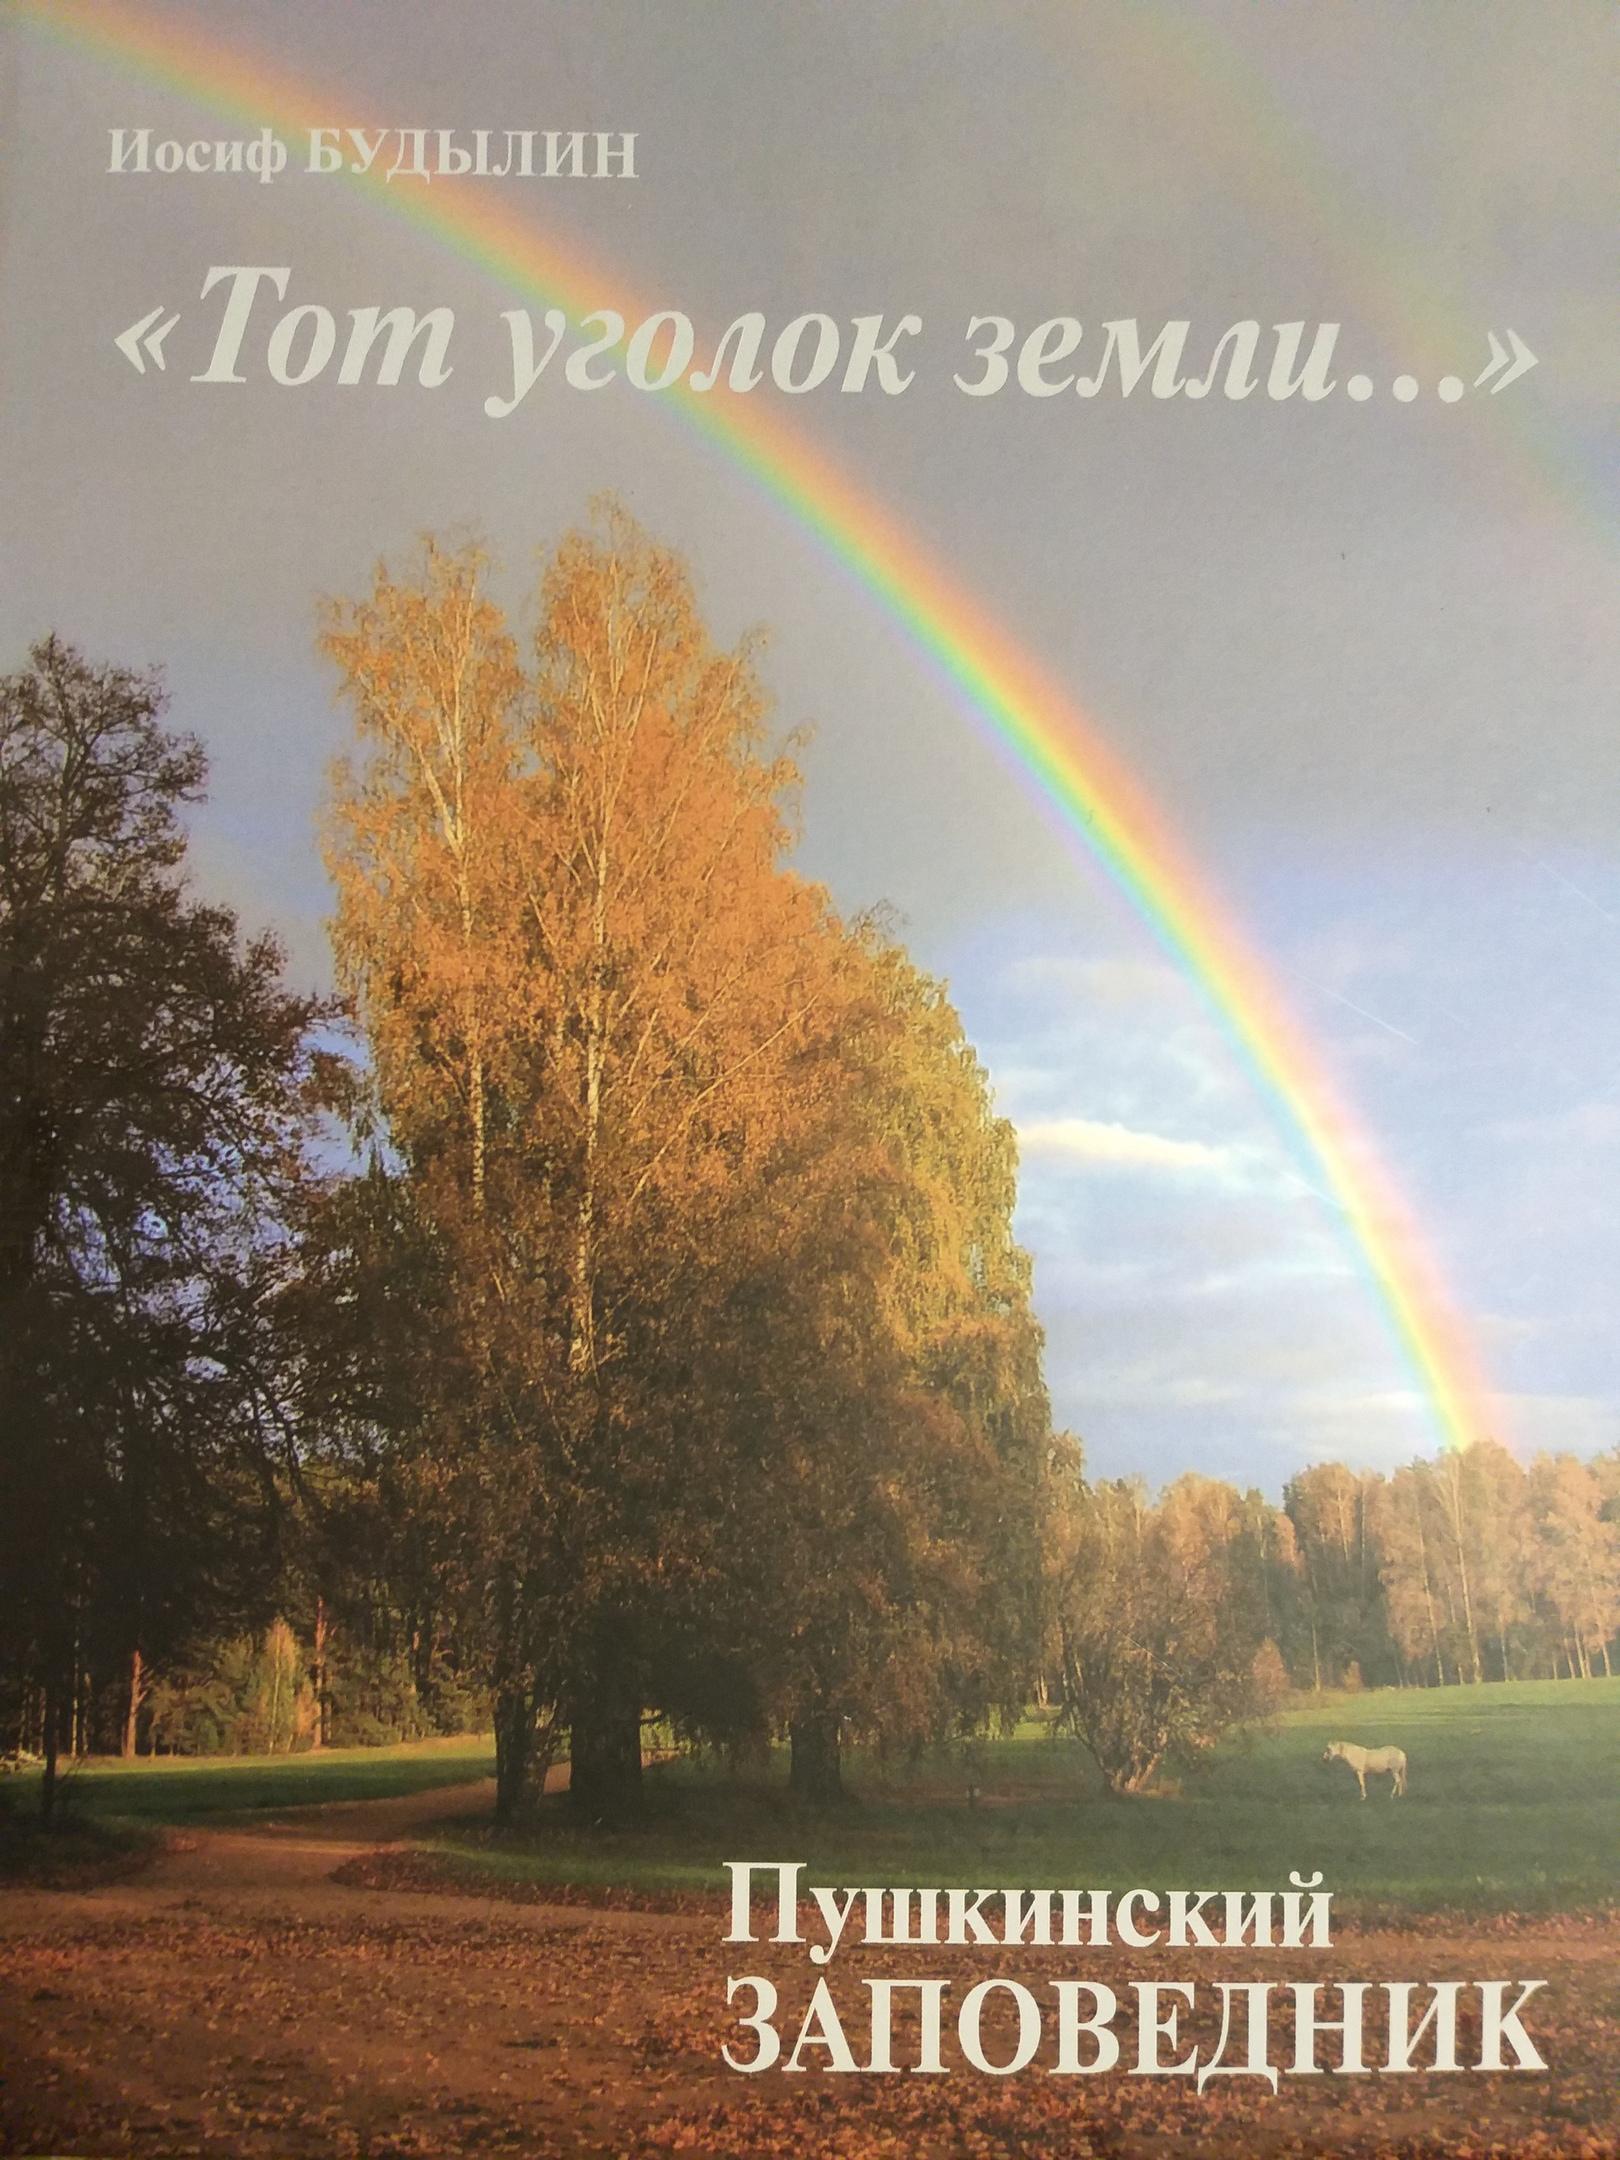 Тот уголок земли- фото обложки альбома И.Т. Будылина о Пушкиногорье